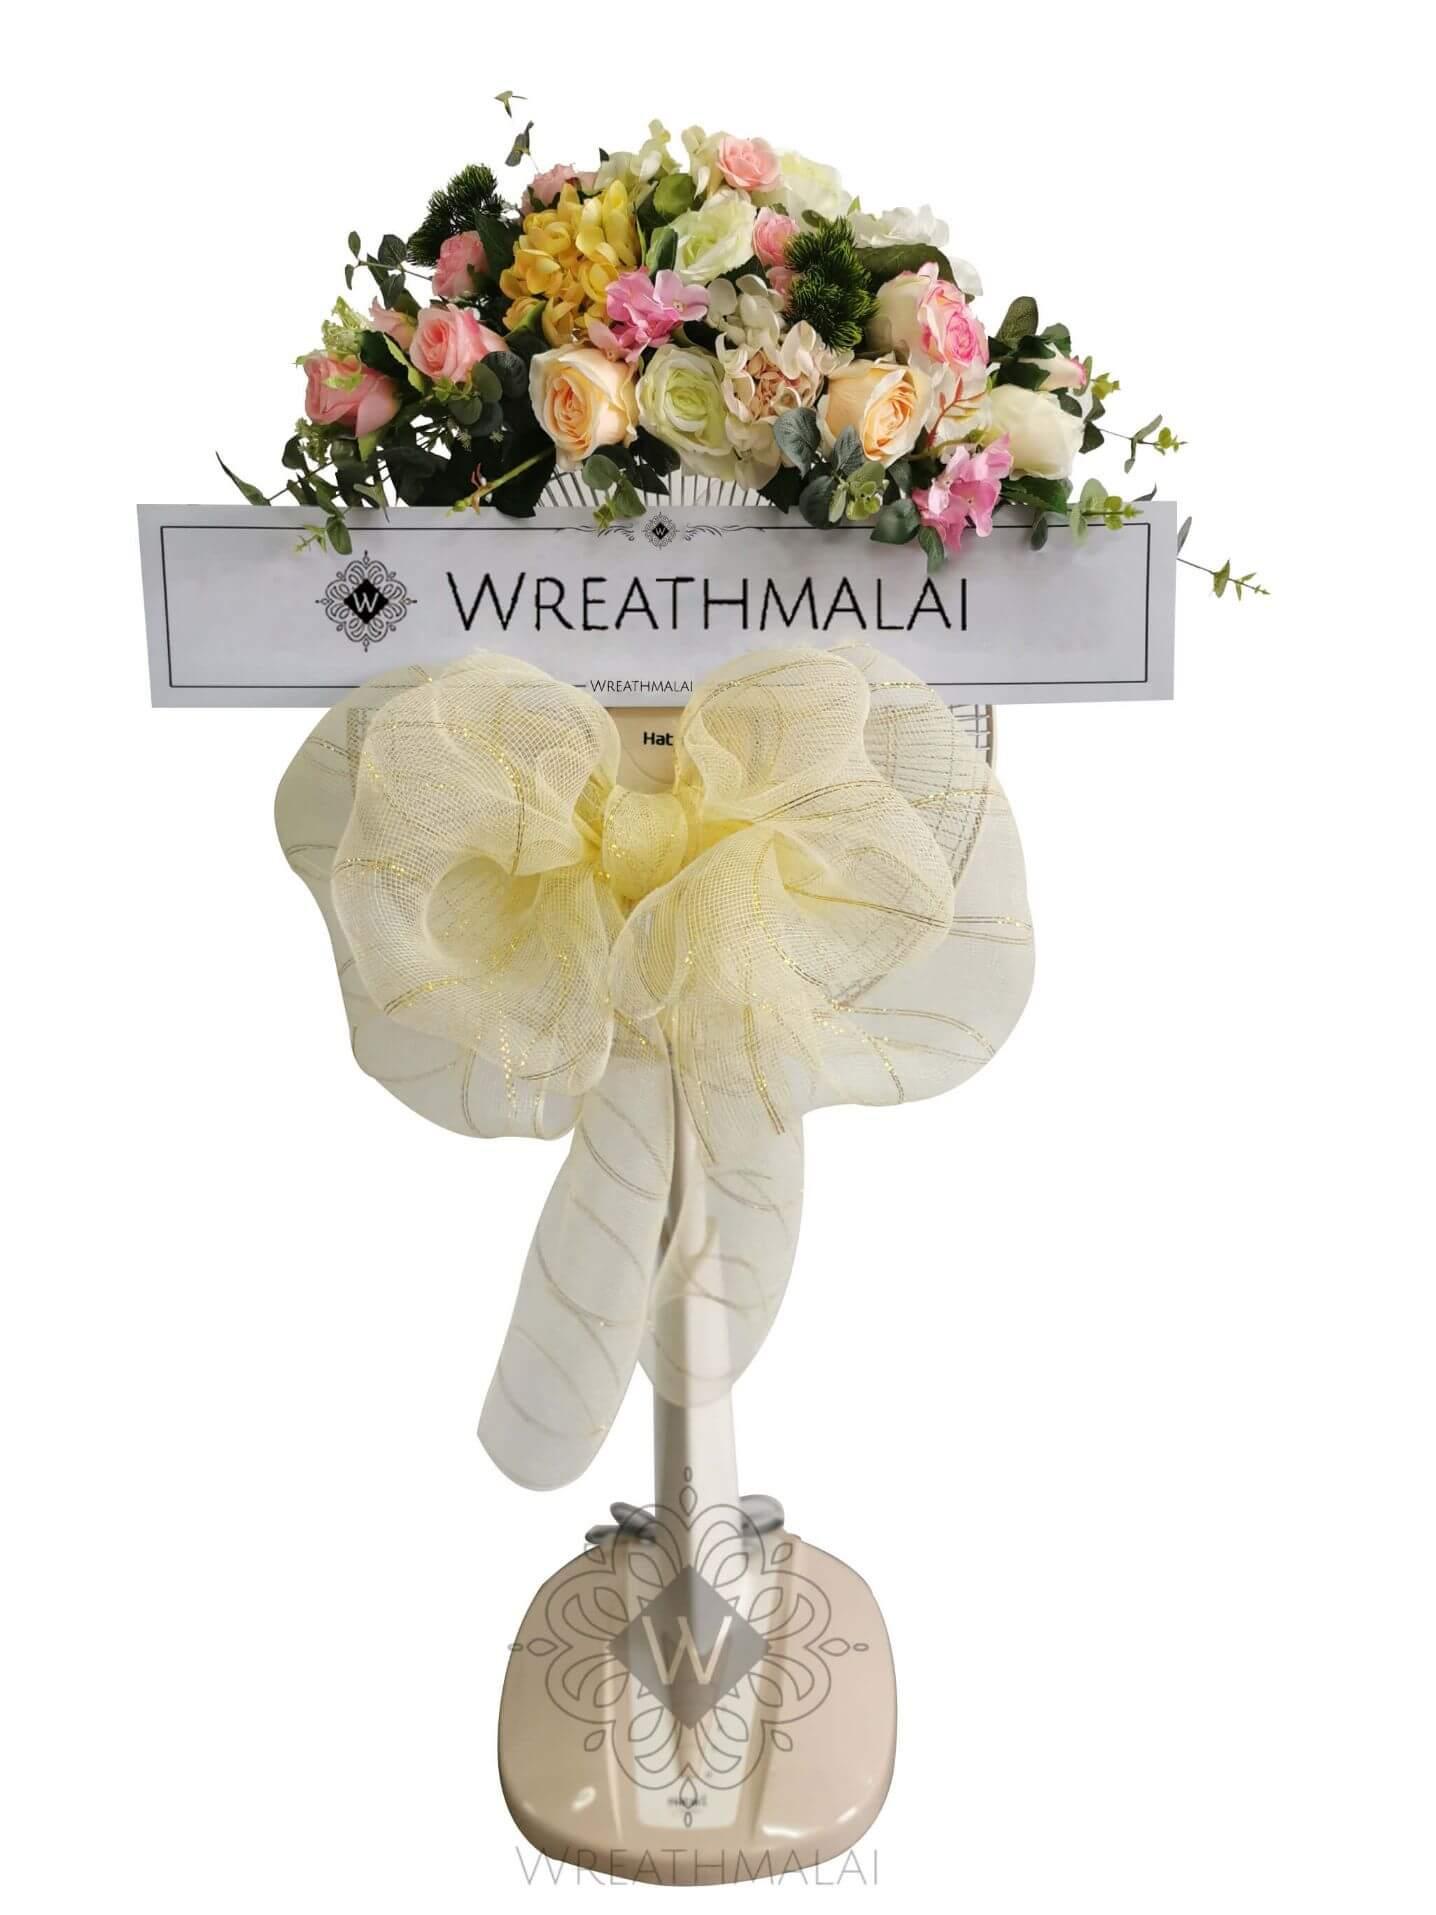 "WF019 พวงหรีด ""มณีจันทร์"" SHARP/HATARI 16 นิ้ว/18 นิ้ว เกลียวโบว์สีครีม และดอกไม้สีพาสเทลจัดช่อสวยงามด้านบน"